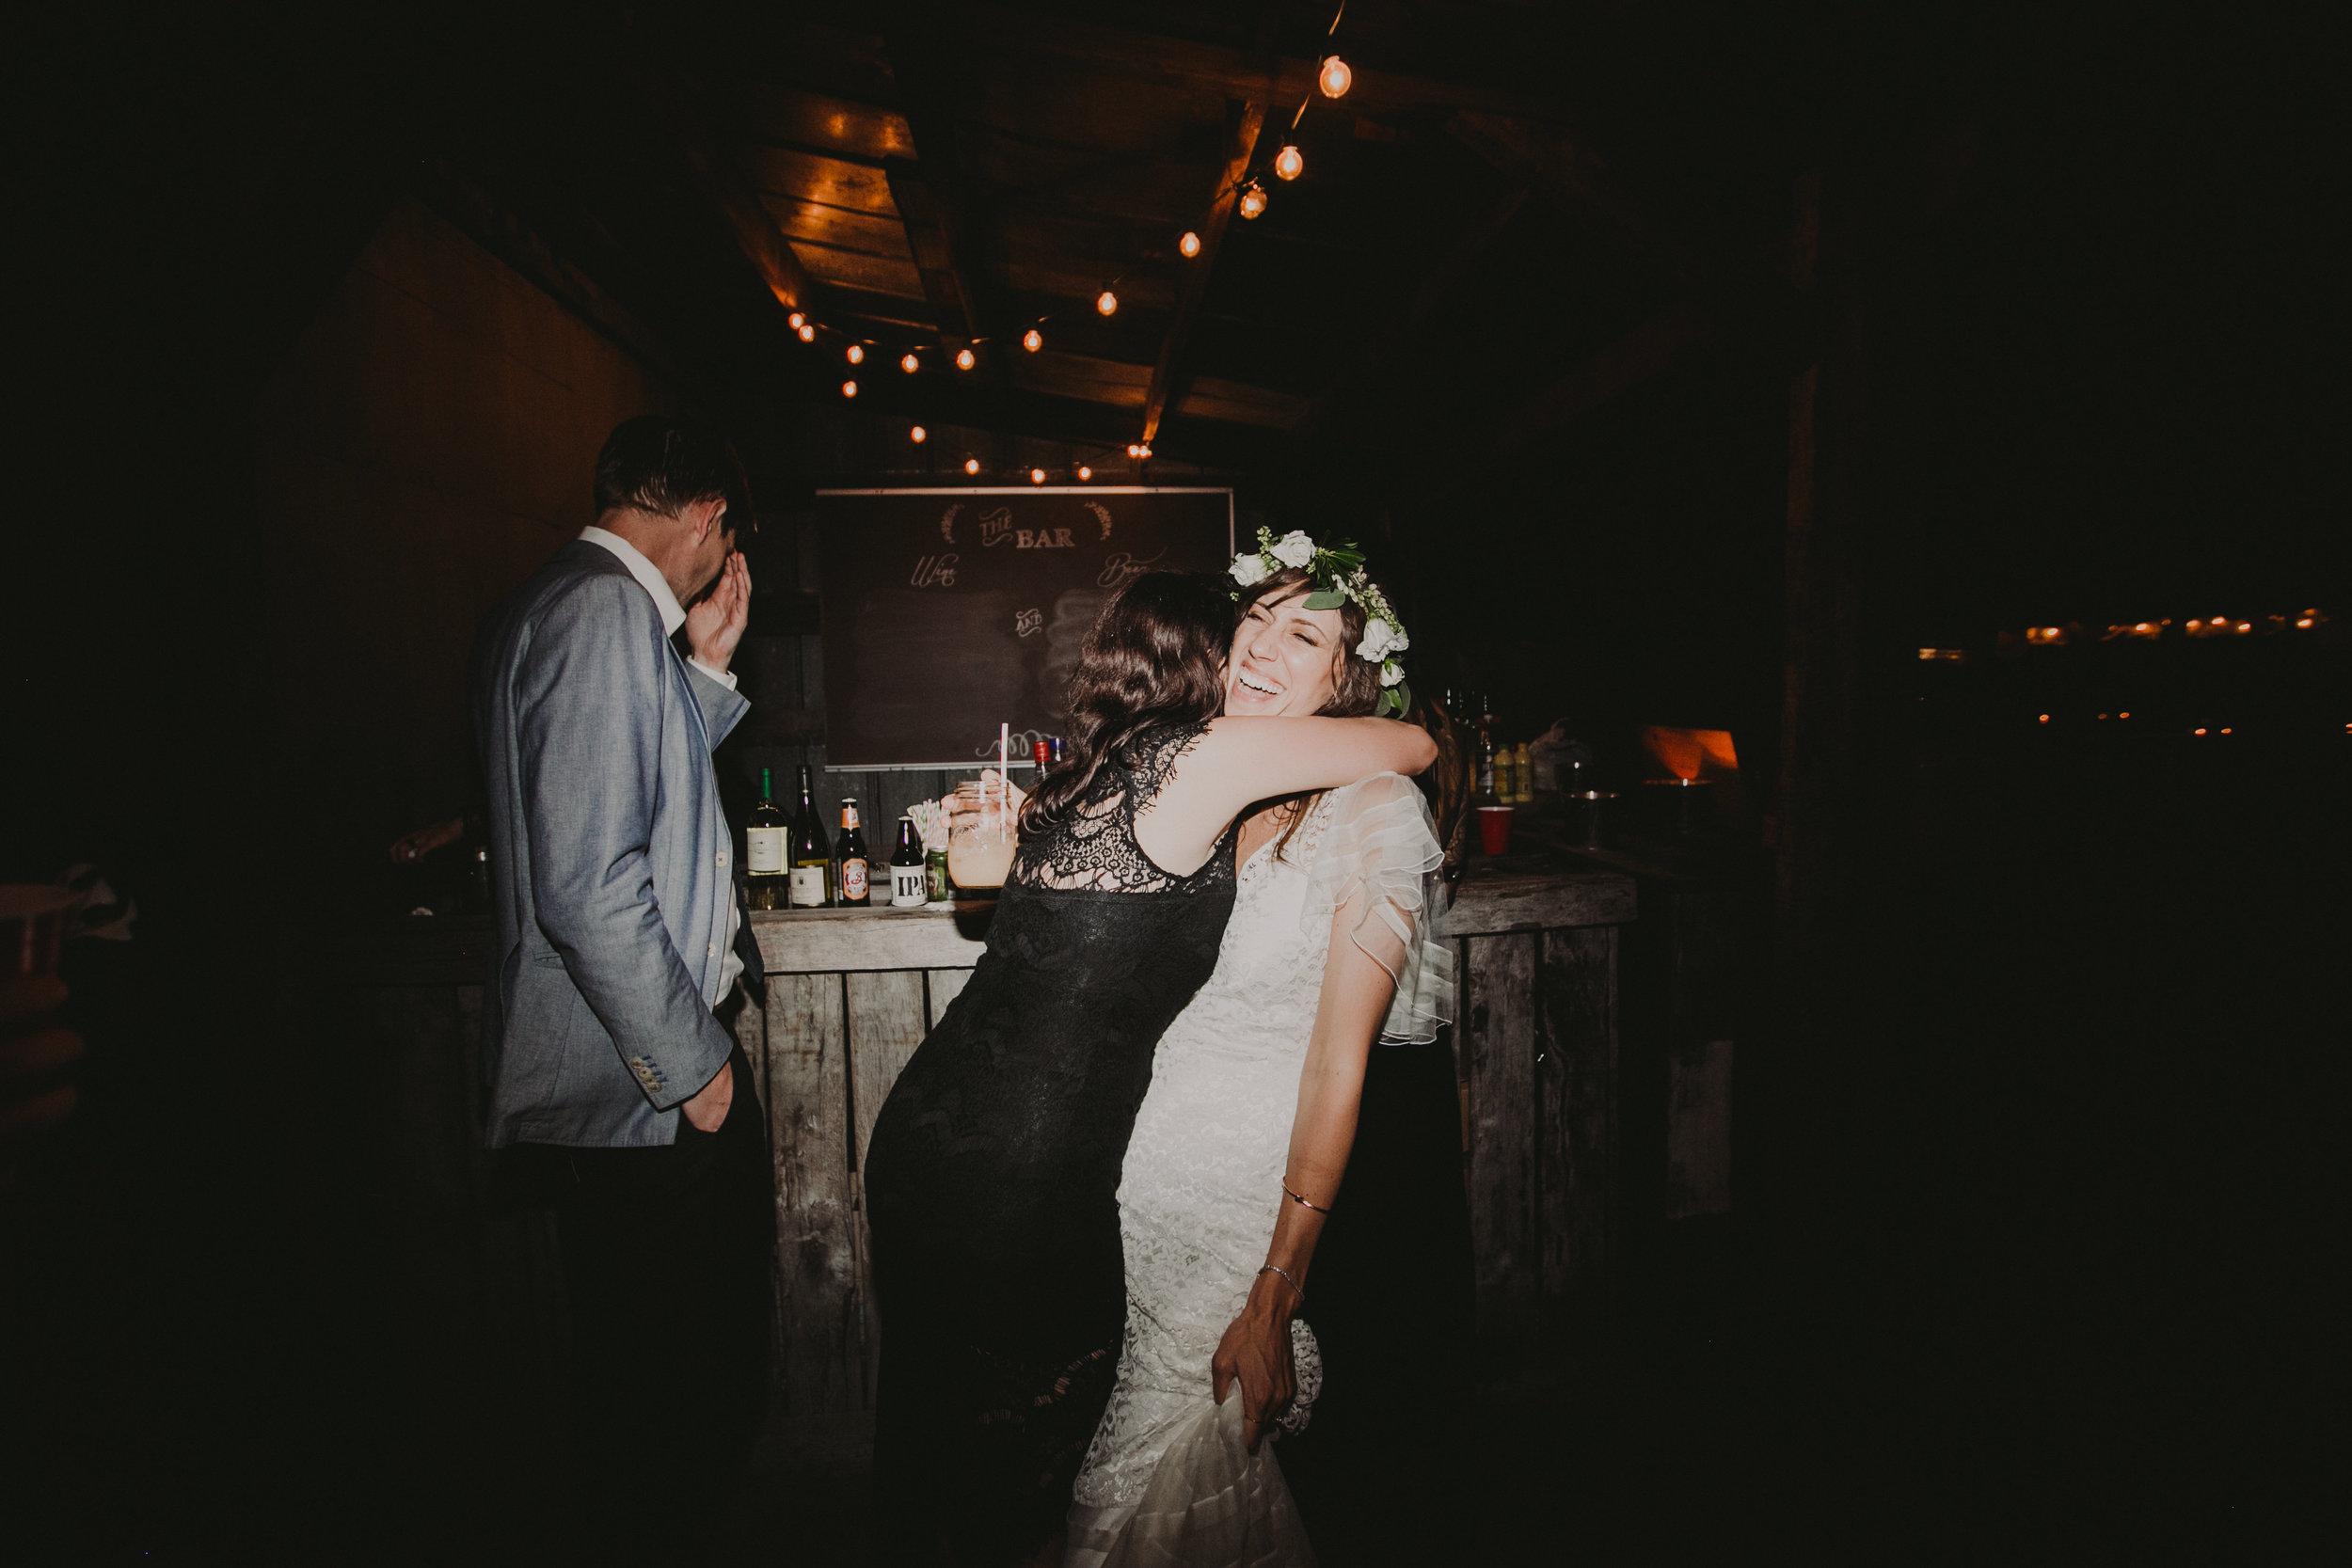 LIBERTY_VIEW_FARM_HIGHLAND_NY_WEDDING_CHELLISE_MICHAEL_PHOTOGRAPHY908.JPG